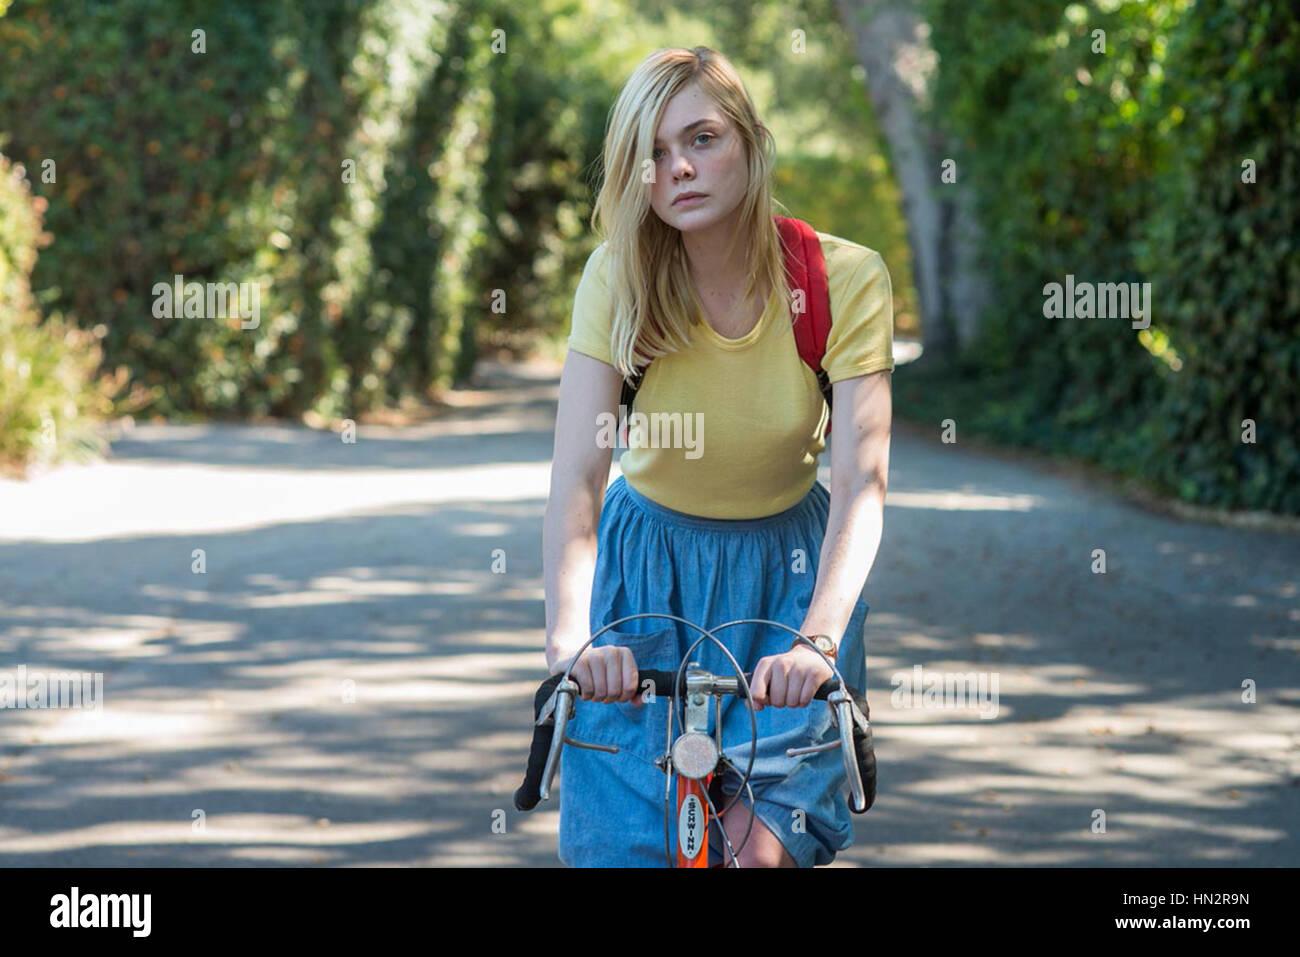 Xx secolo le donne (2016) elle fanning Mike Mills (dir) annapurna pictures/raccolta moviestore ltd Immagini Stock